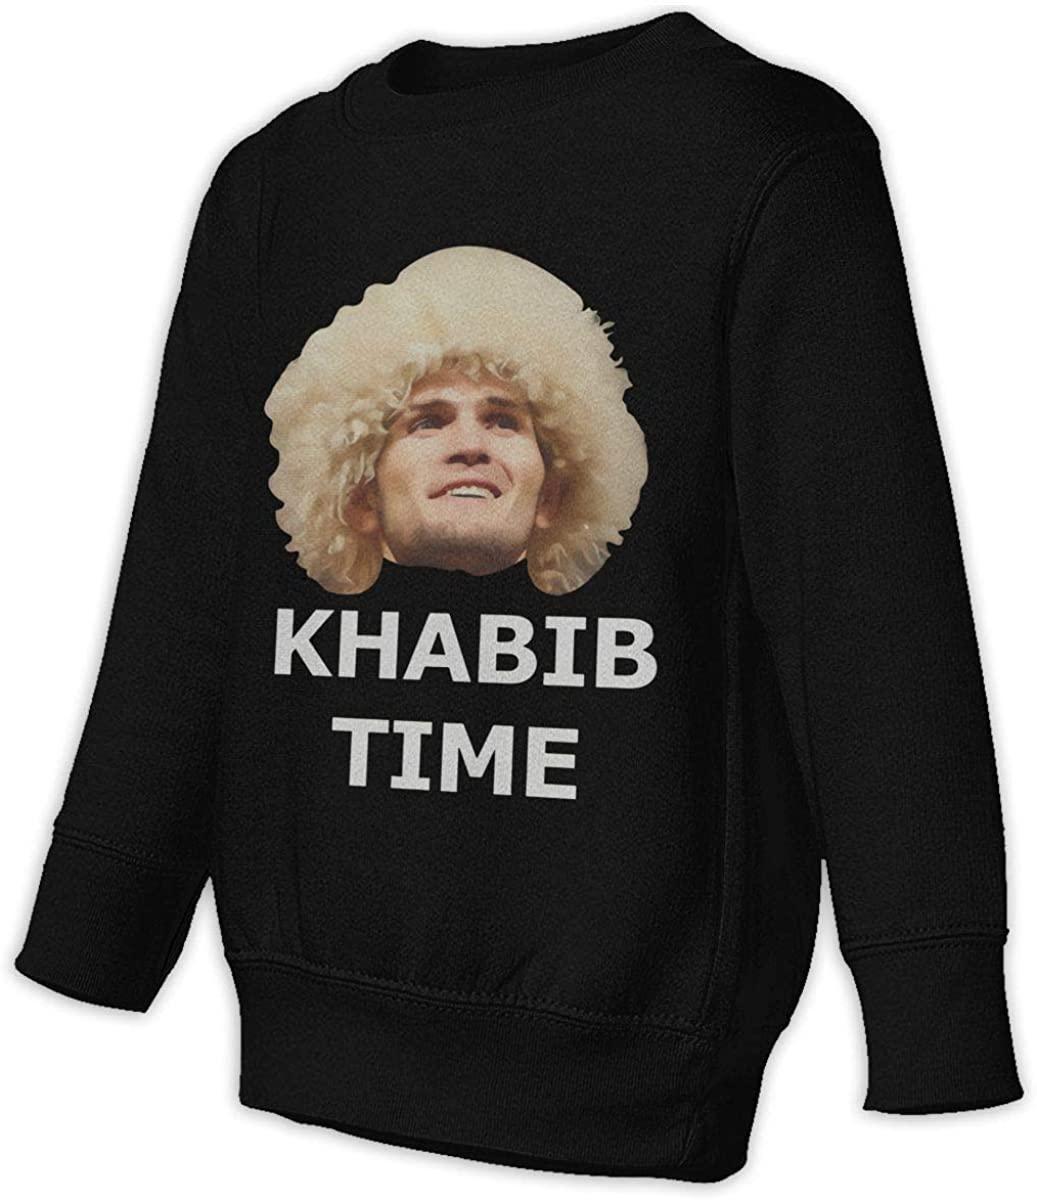 Manbeak Khabib Time Khabib Nurmagomedov Unisex Sweatshirt Youth Boy and Girls Pullover Sweatshirt Black